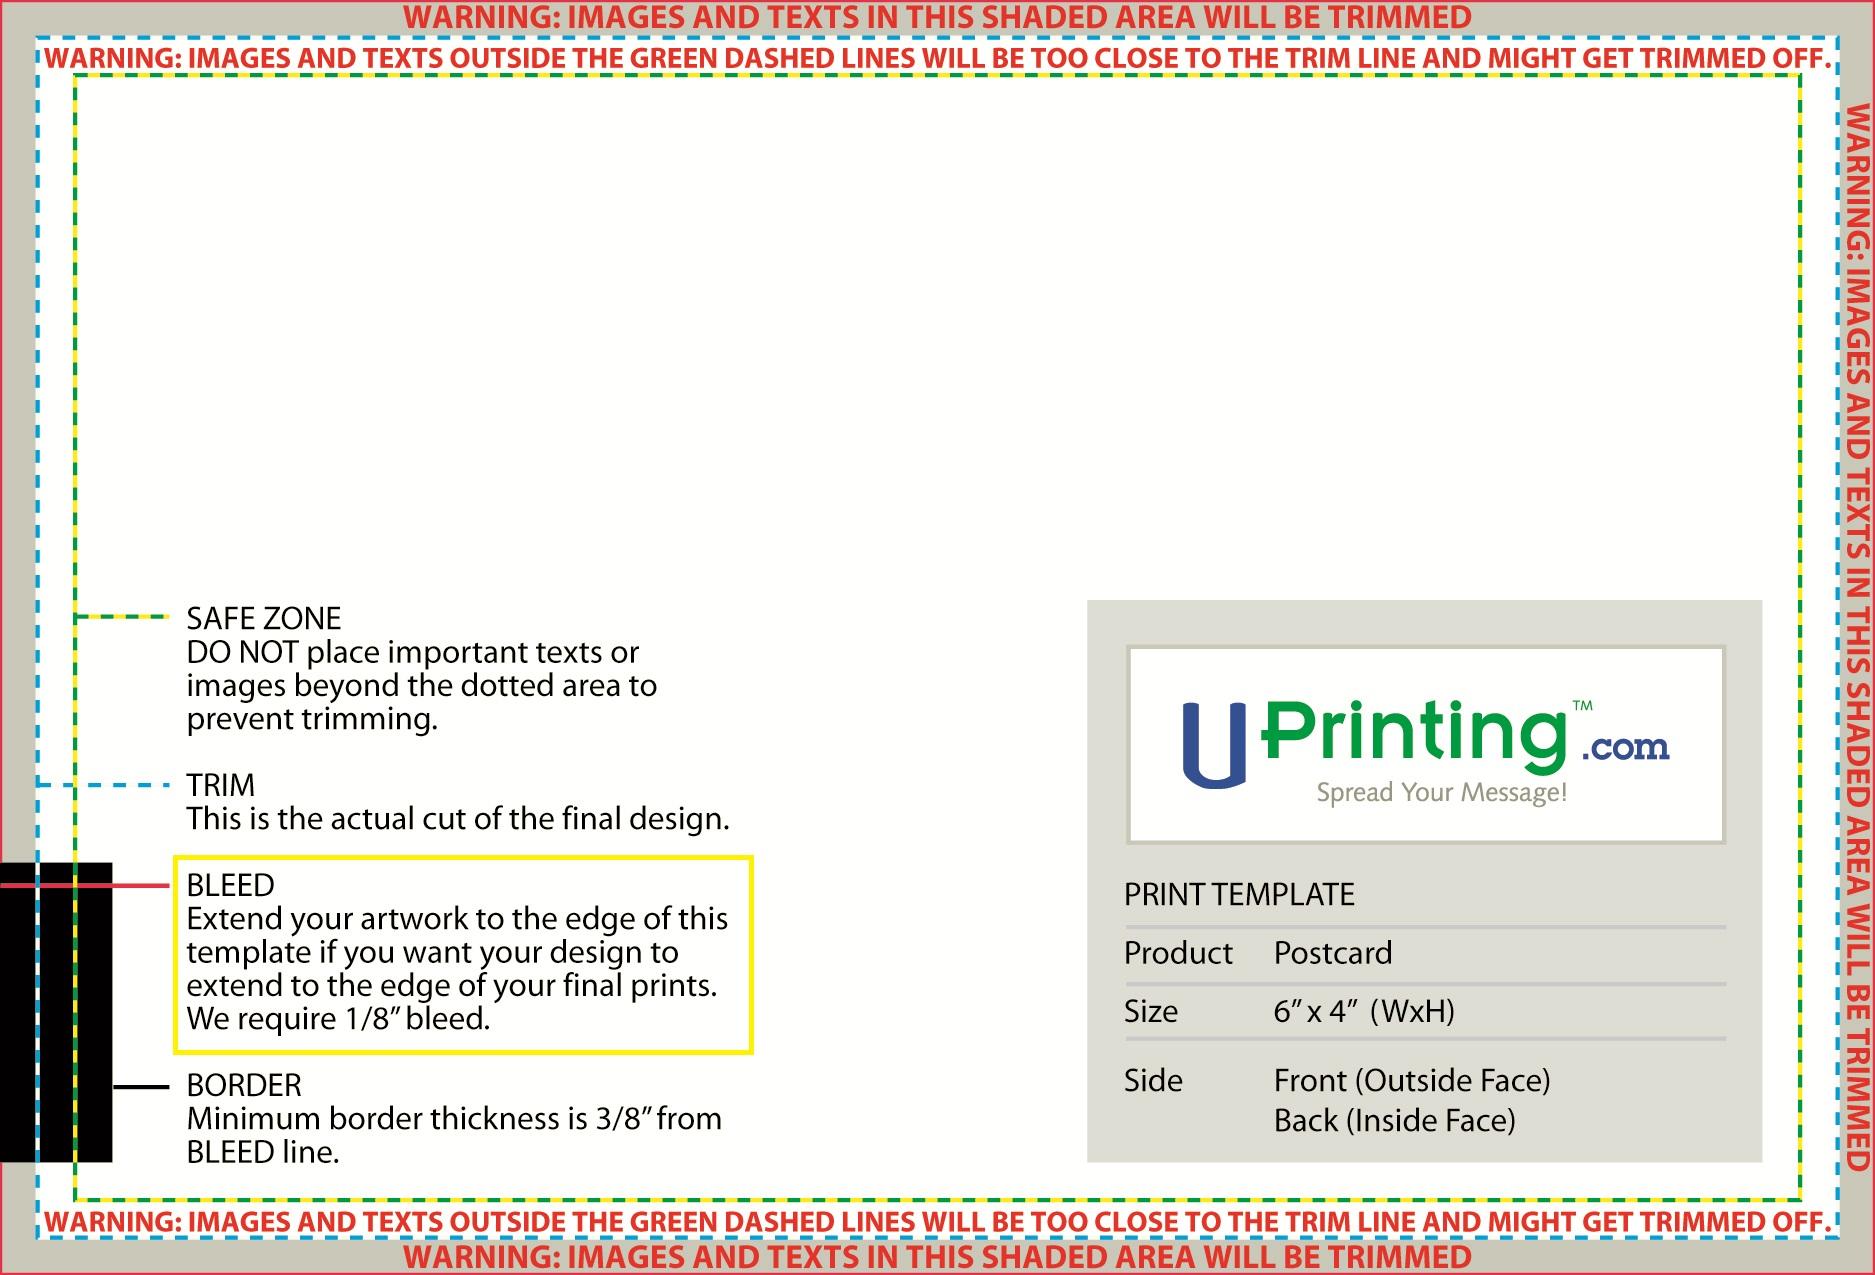 Standard Postcard Size Template - 6x4 postcard template